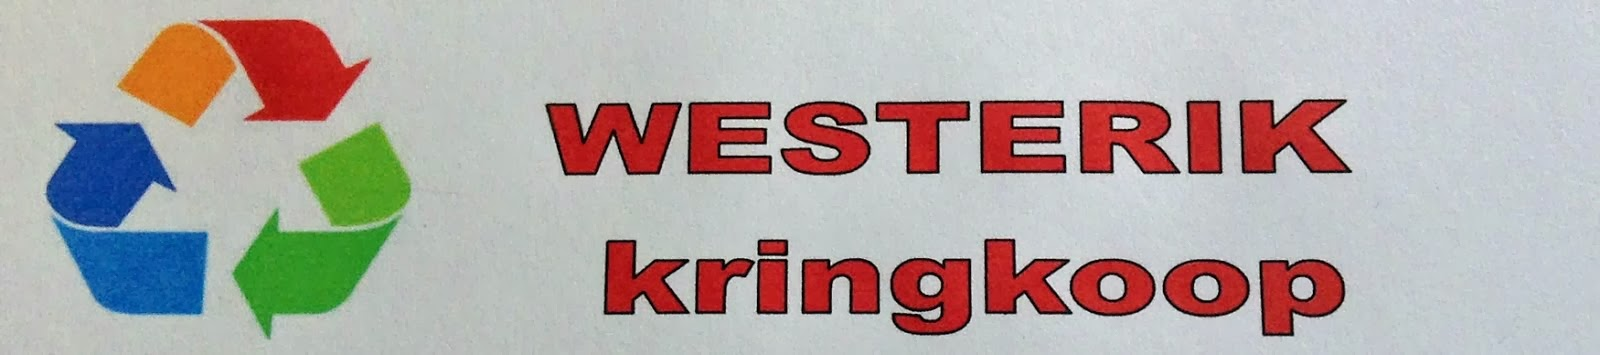 Westerik Kringkoop